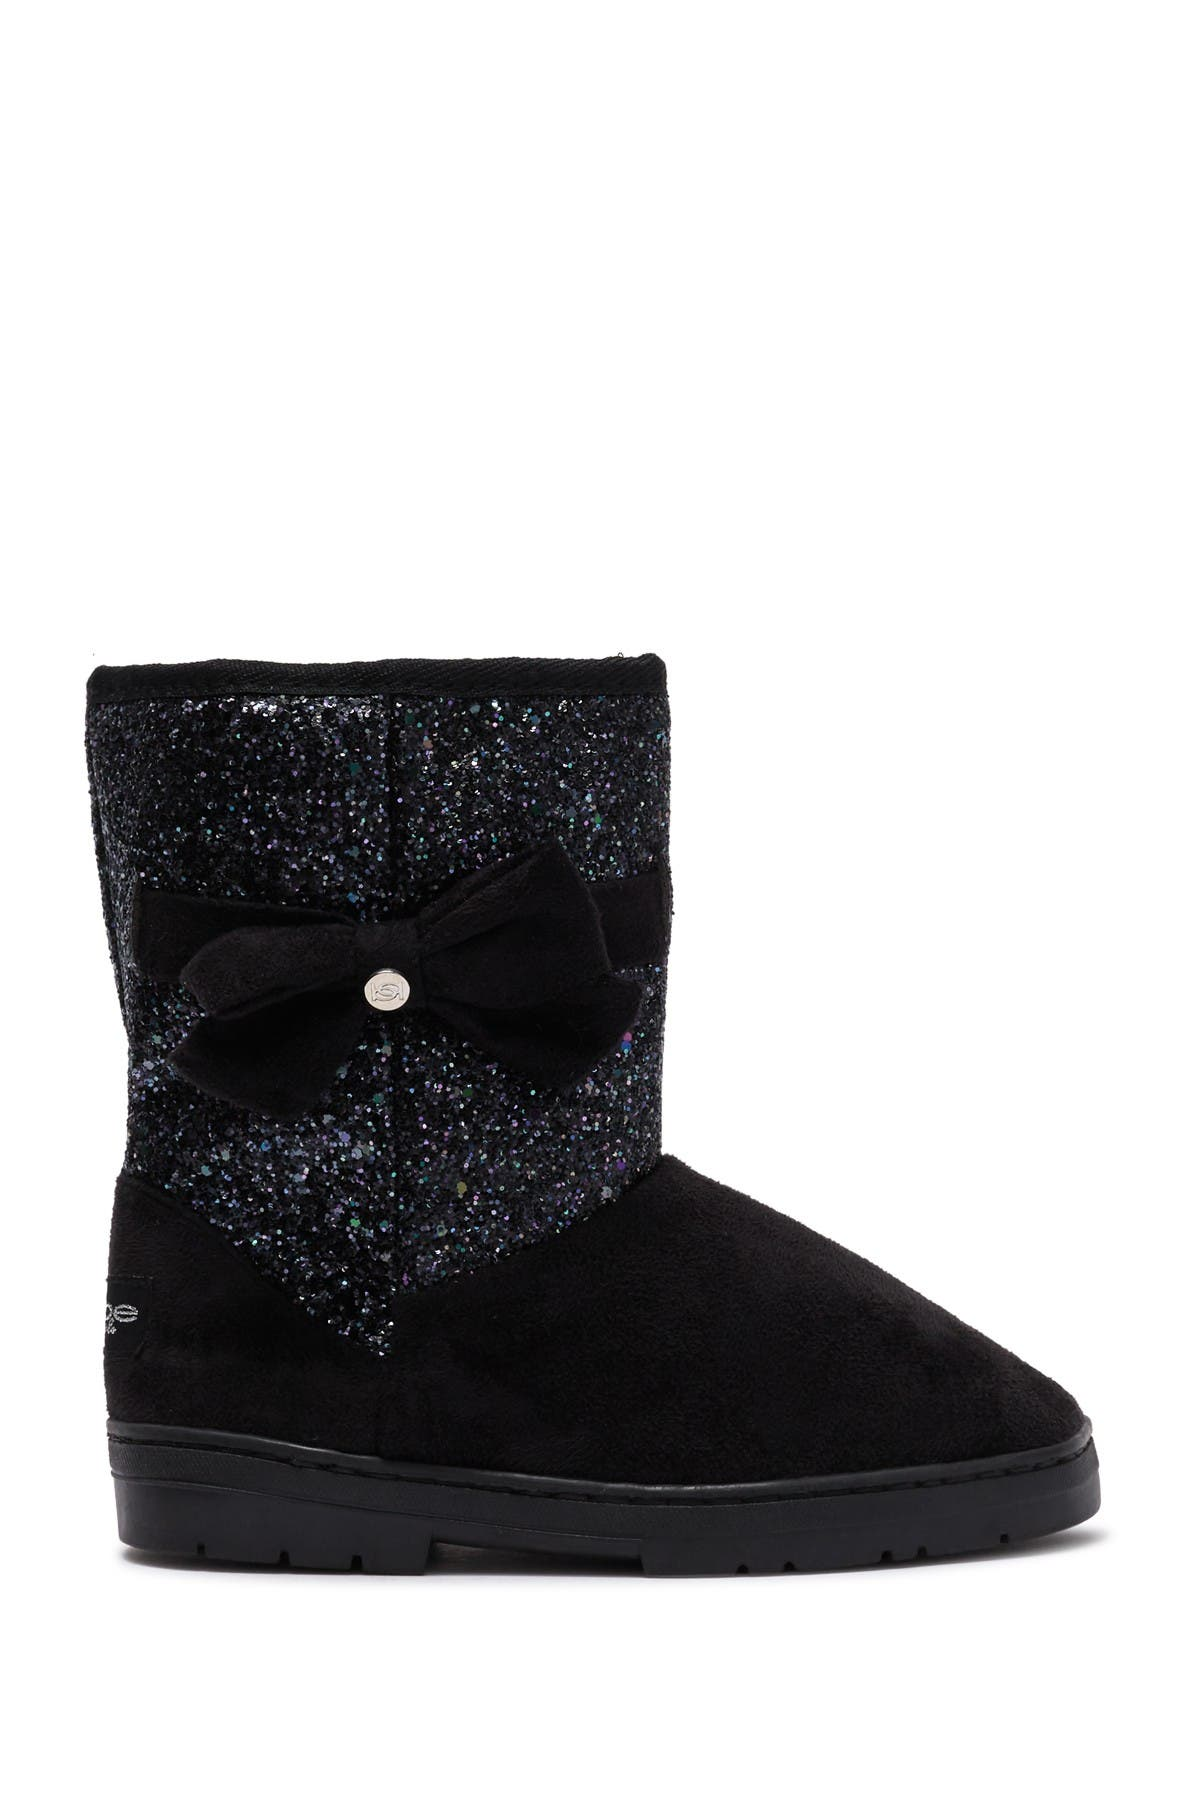 Bebe Microsuede Glitter Faux Fur Winter Boot